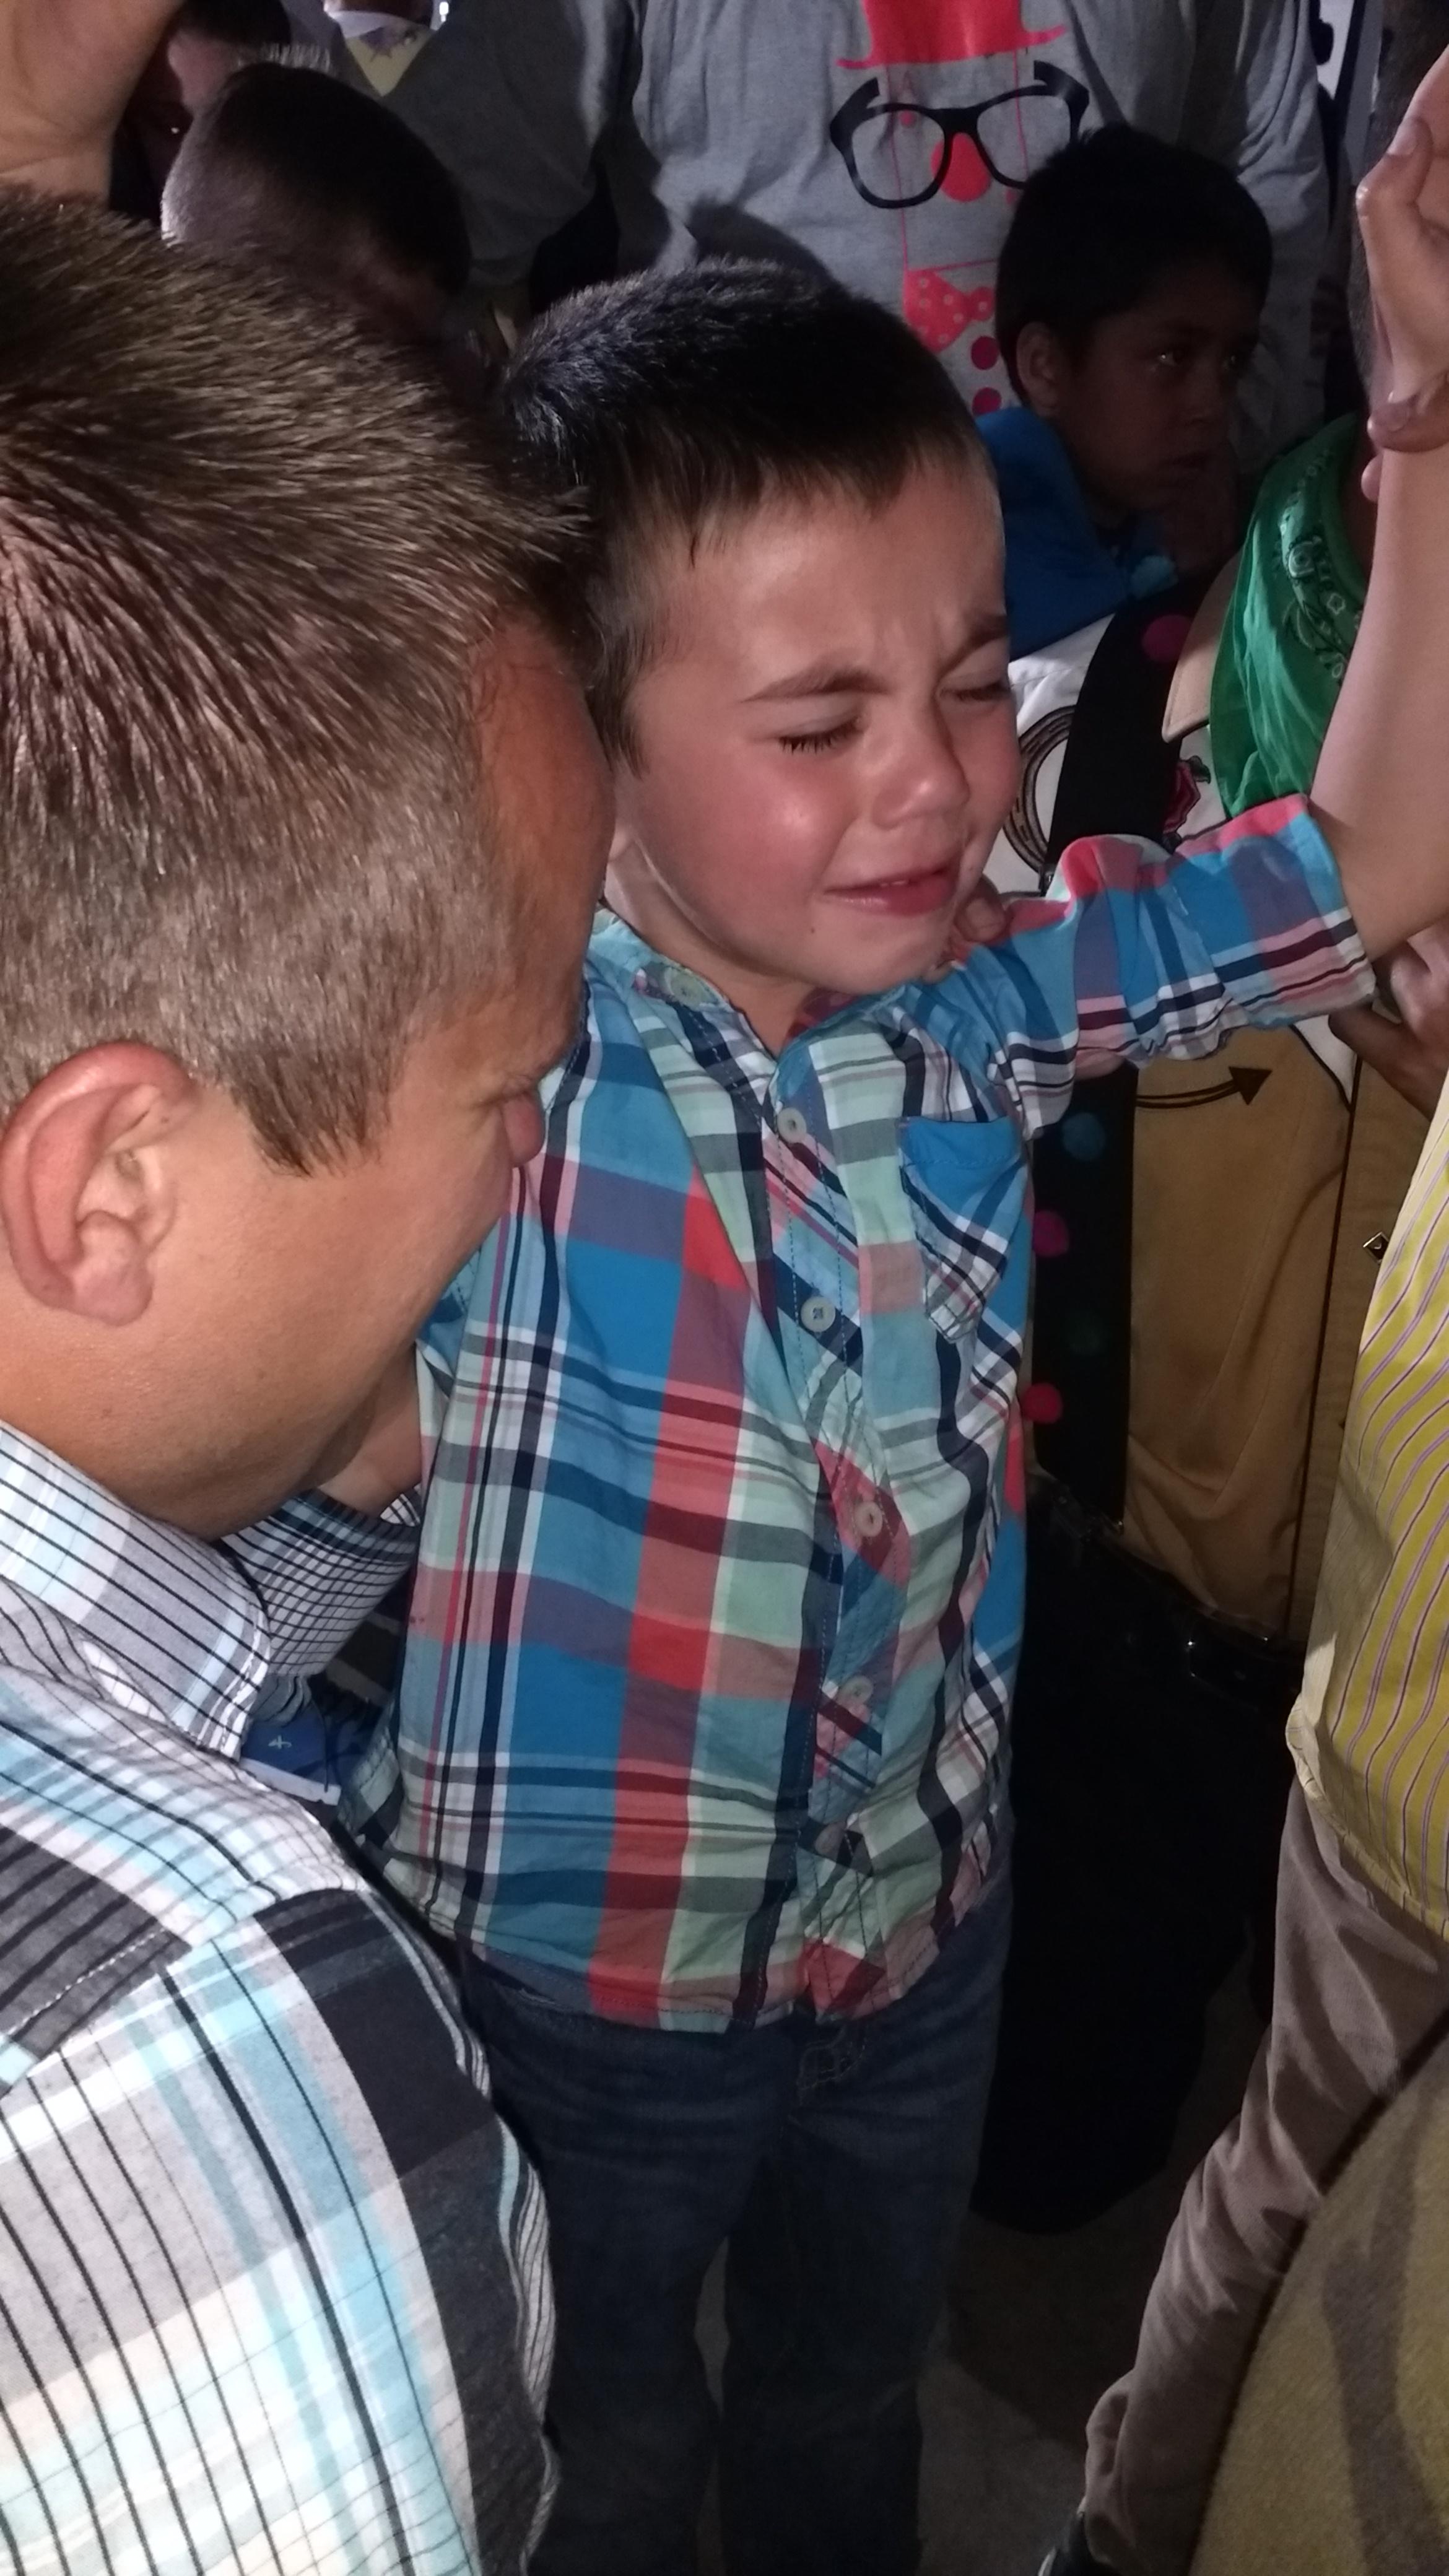 Bro. Matthew praying with Jared